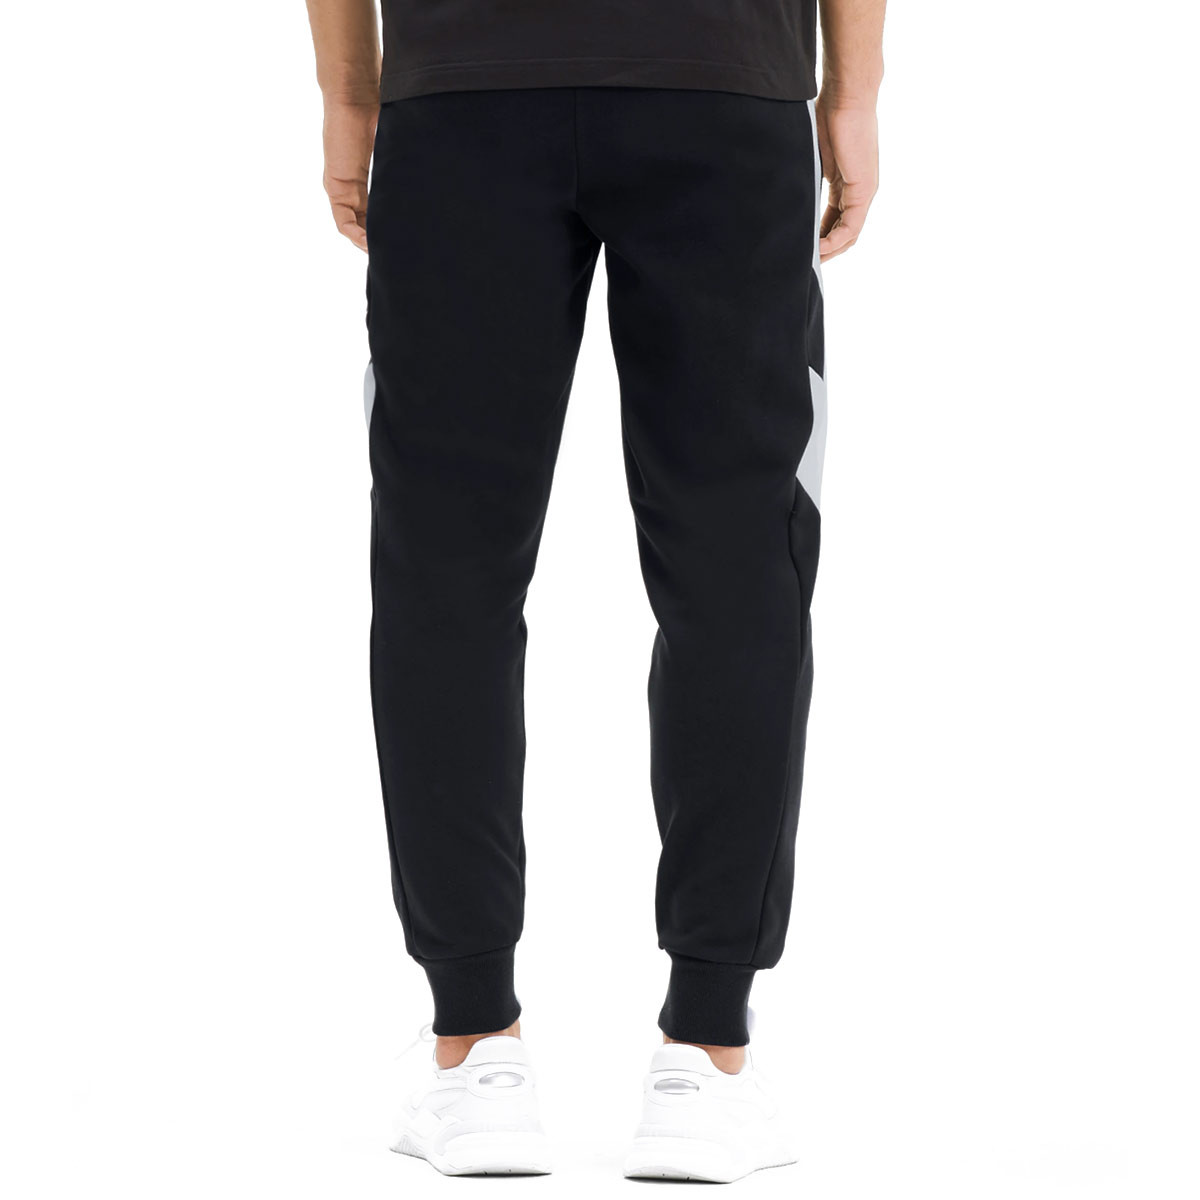 Pantalon Puma Modern Sports Pants Fl Urbano Para Hombre Runa Store